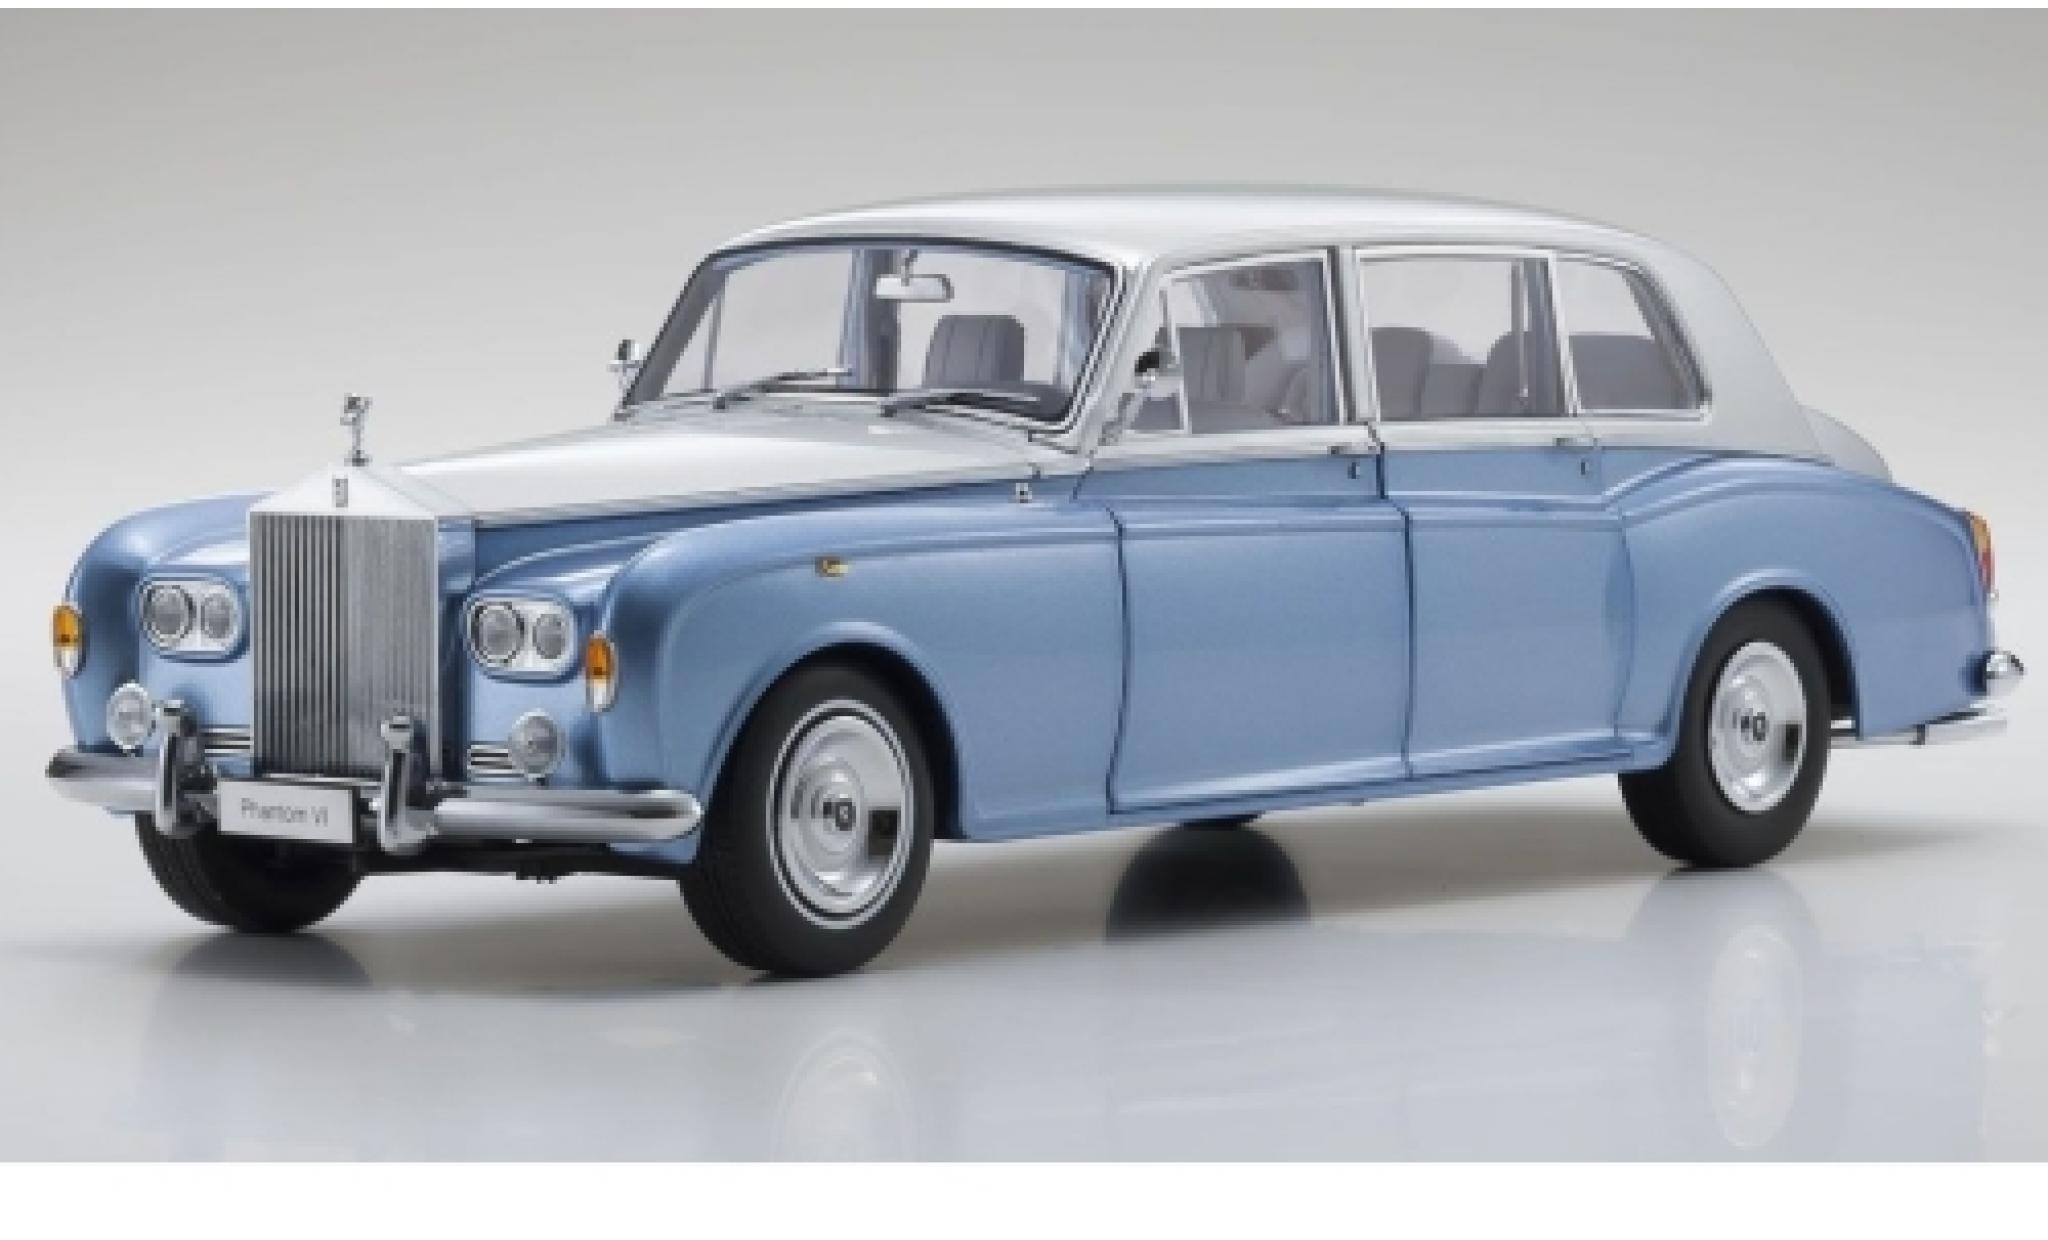 Rolls Royce Phantom 1/18 Kyosho VI metallise blue/grey RHD